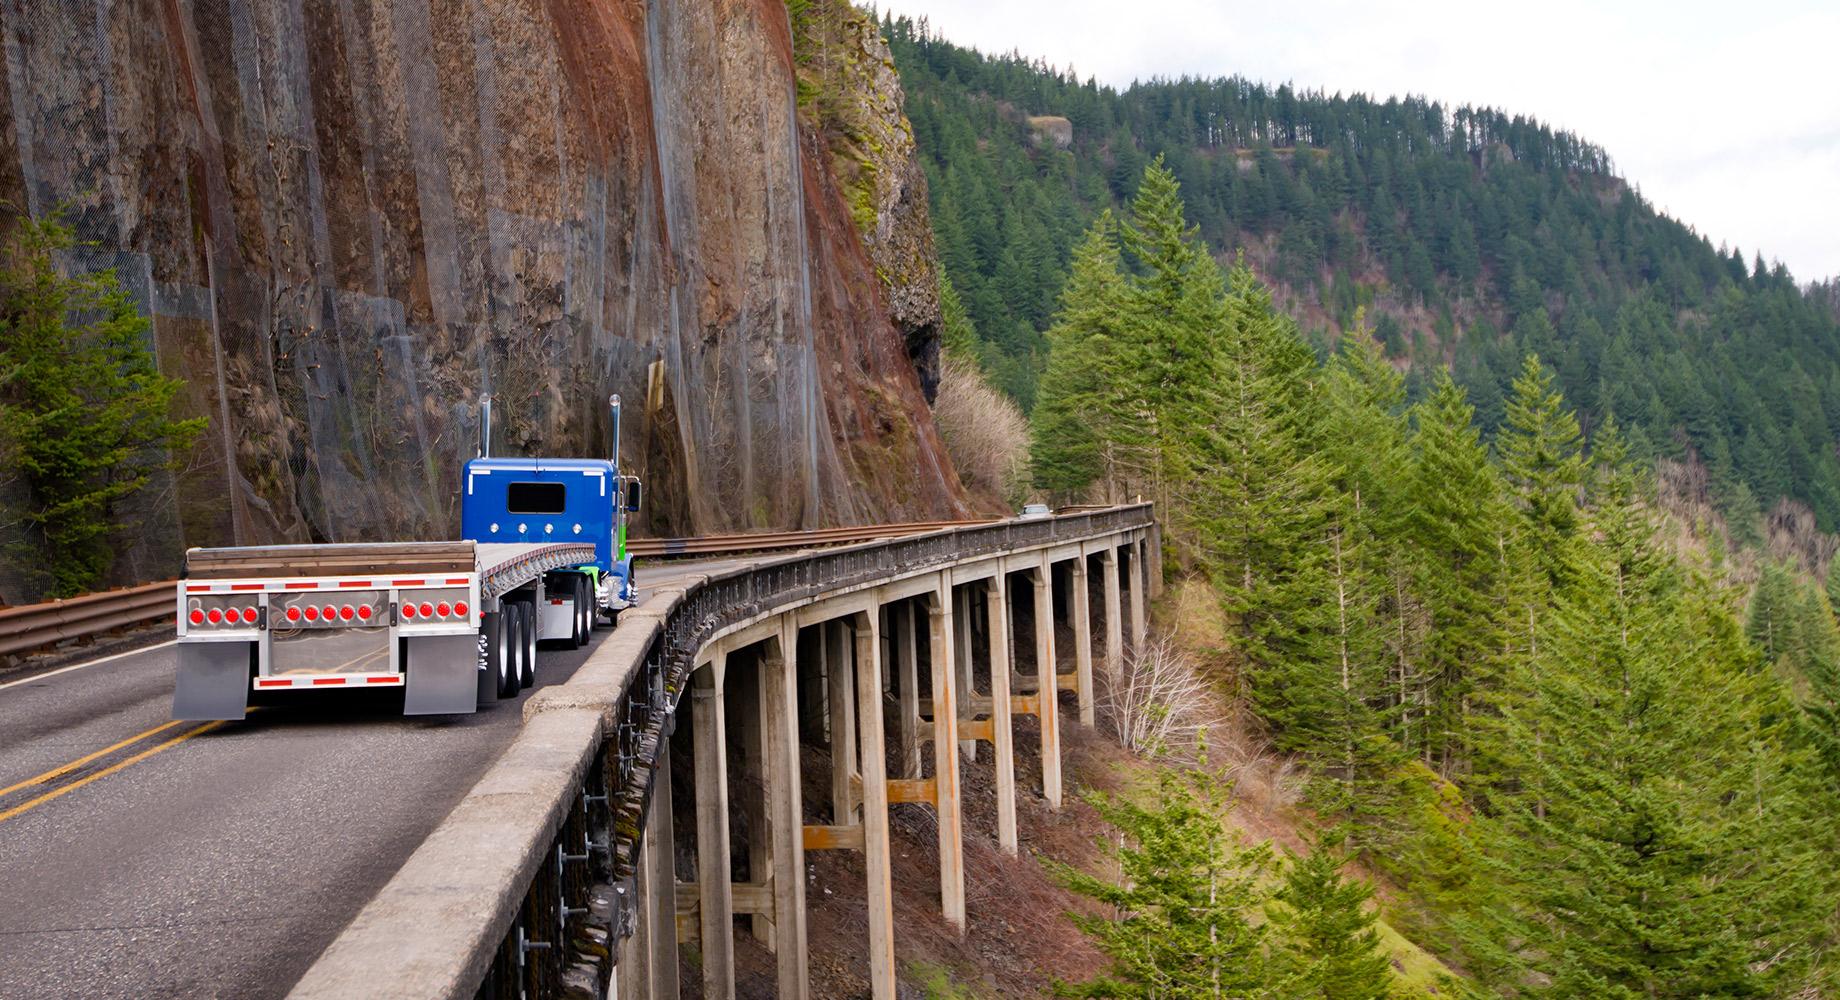 Camión yendo a campo traviesa